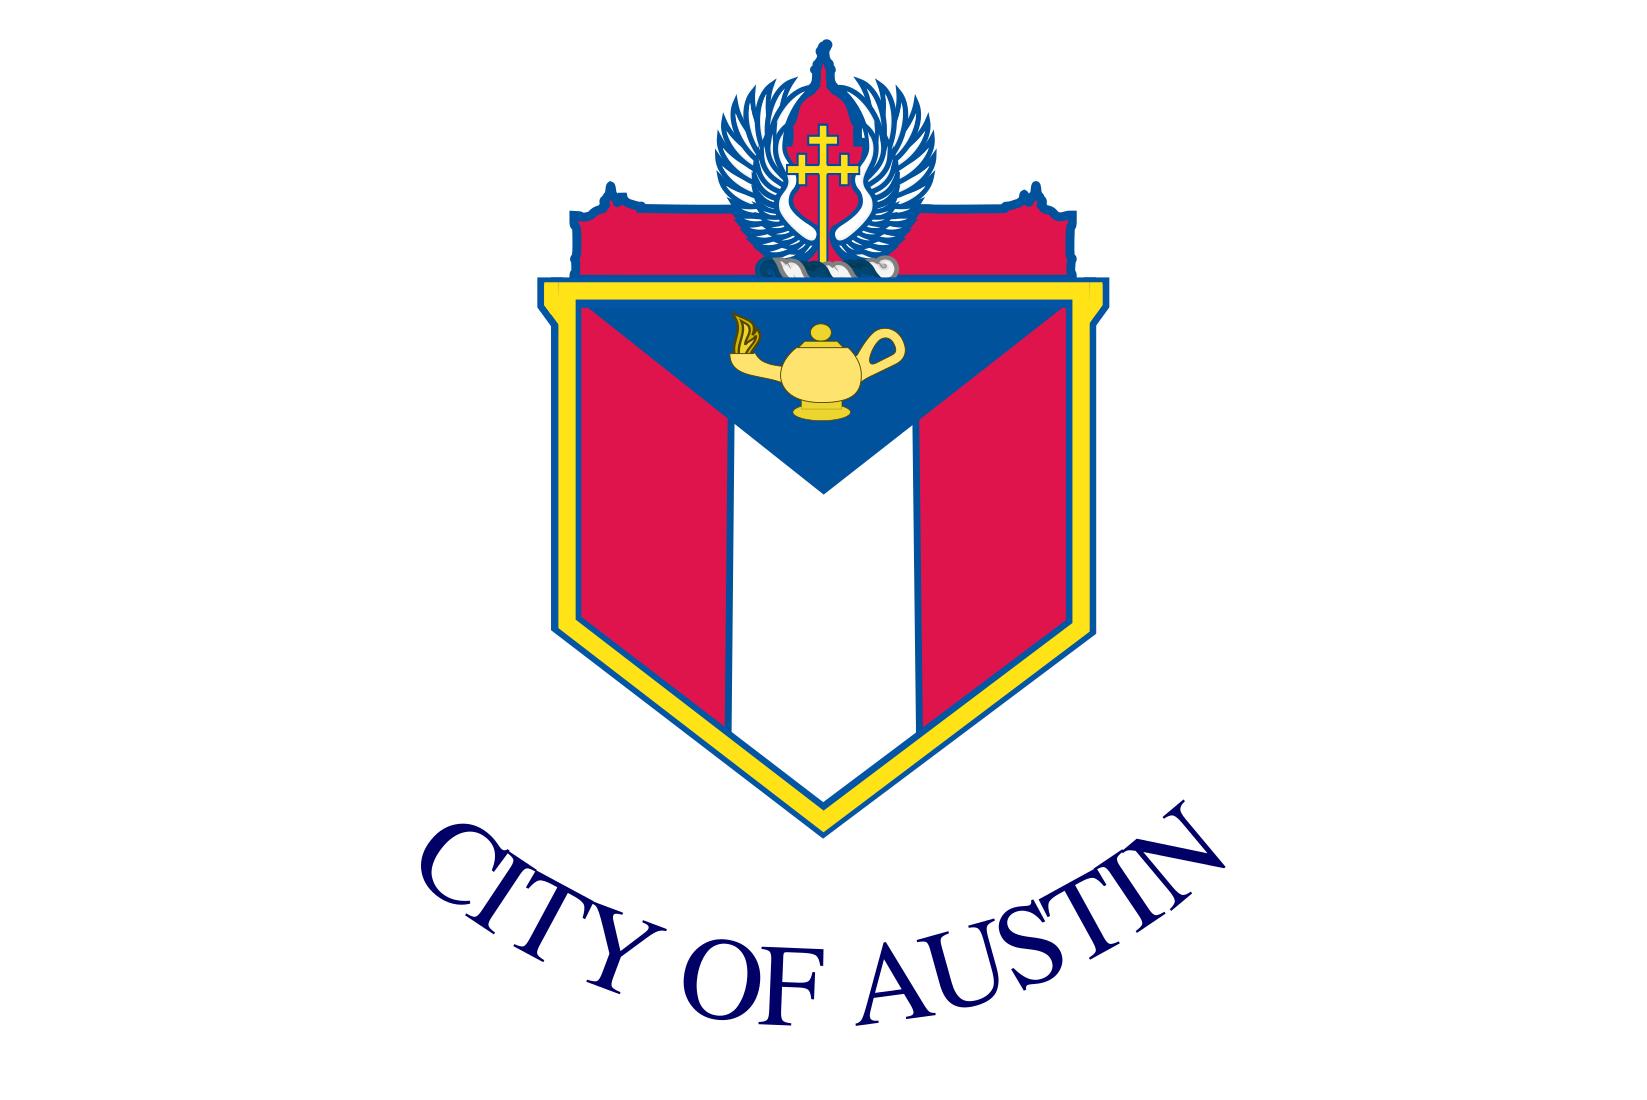 File:Flag of Austin, Texas.svg.